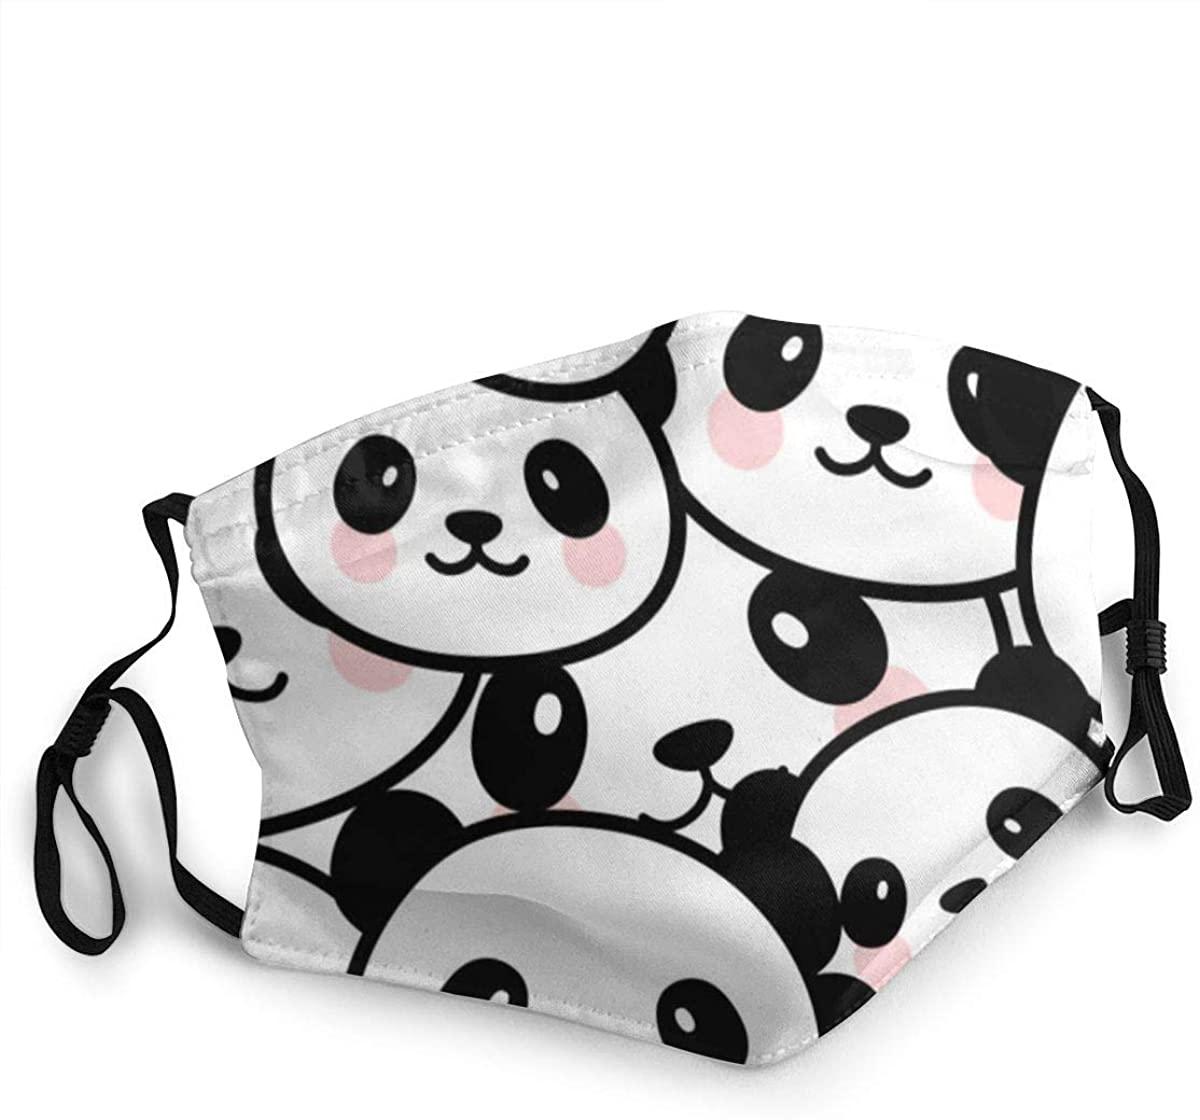 Anti-dust Mouth Face Mask Panda 2-Layer Unisex Reusable Fashion Washable Cover